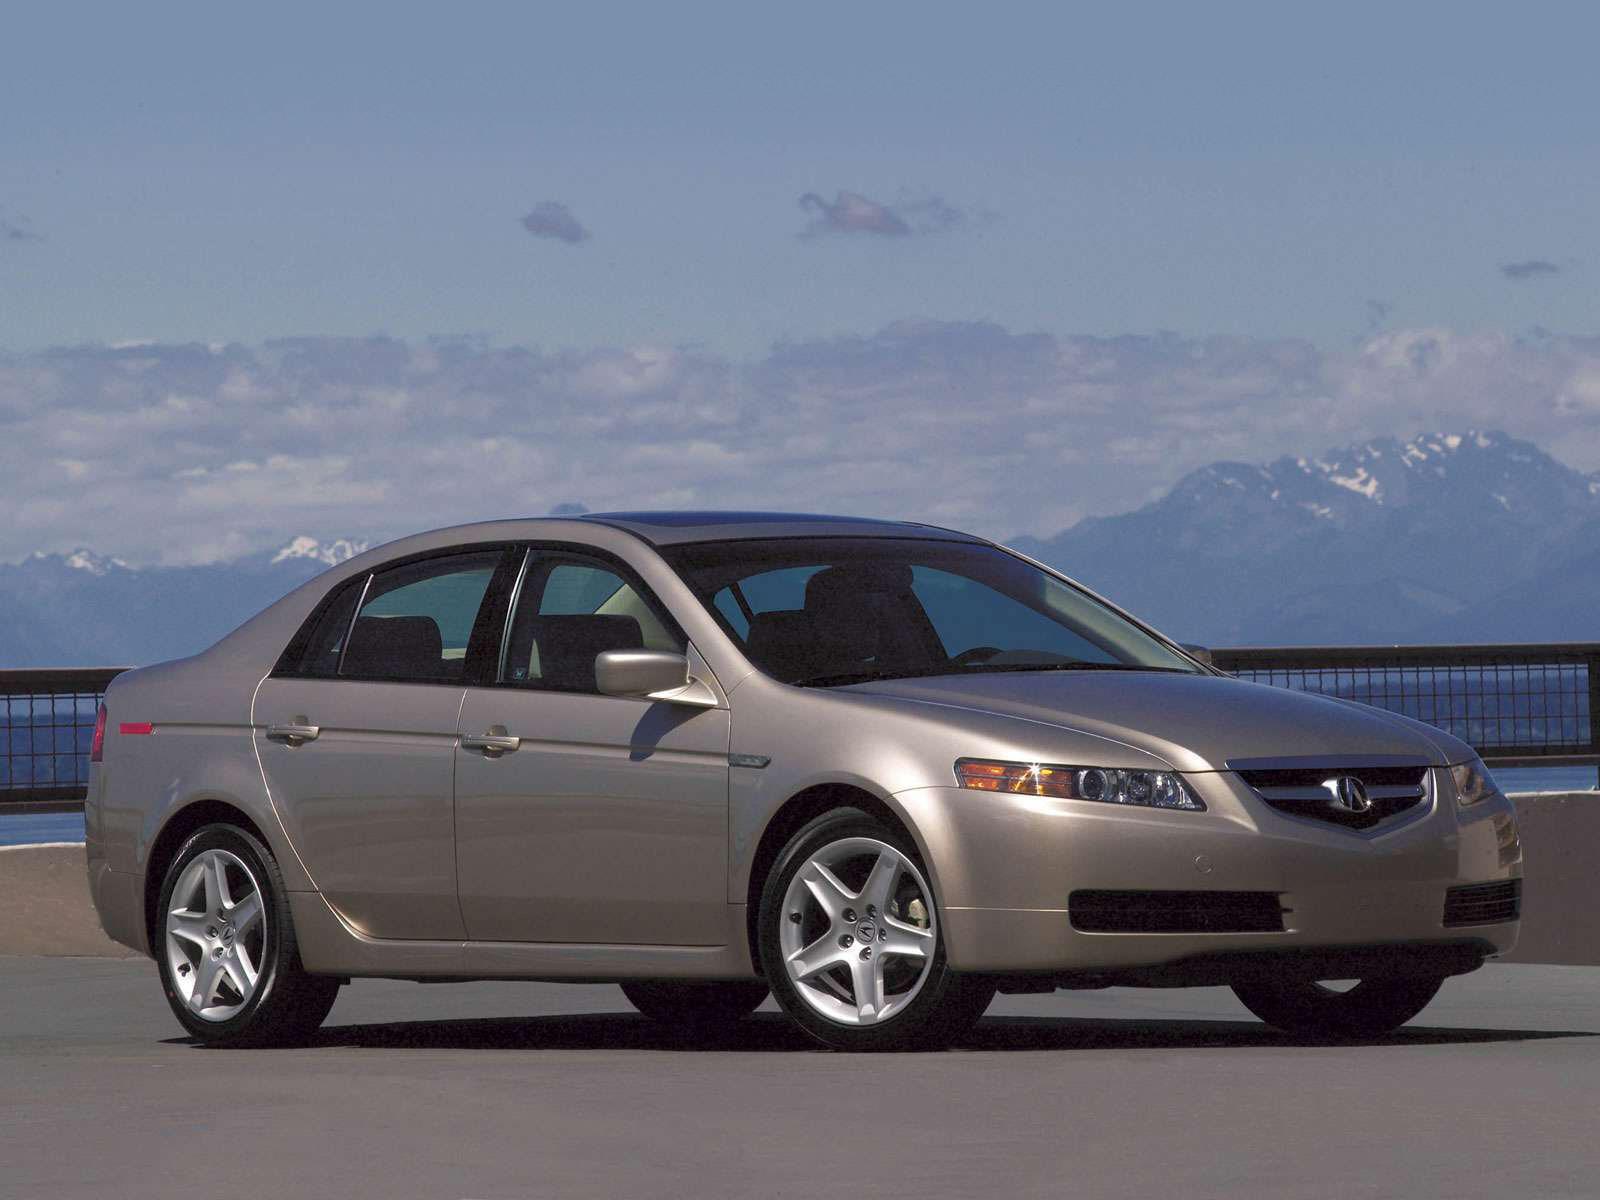 2005 Acura TL Car Insurance